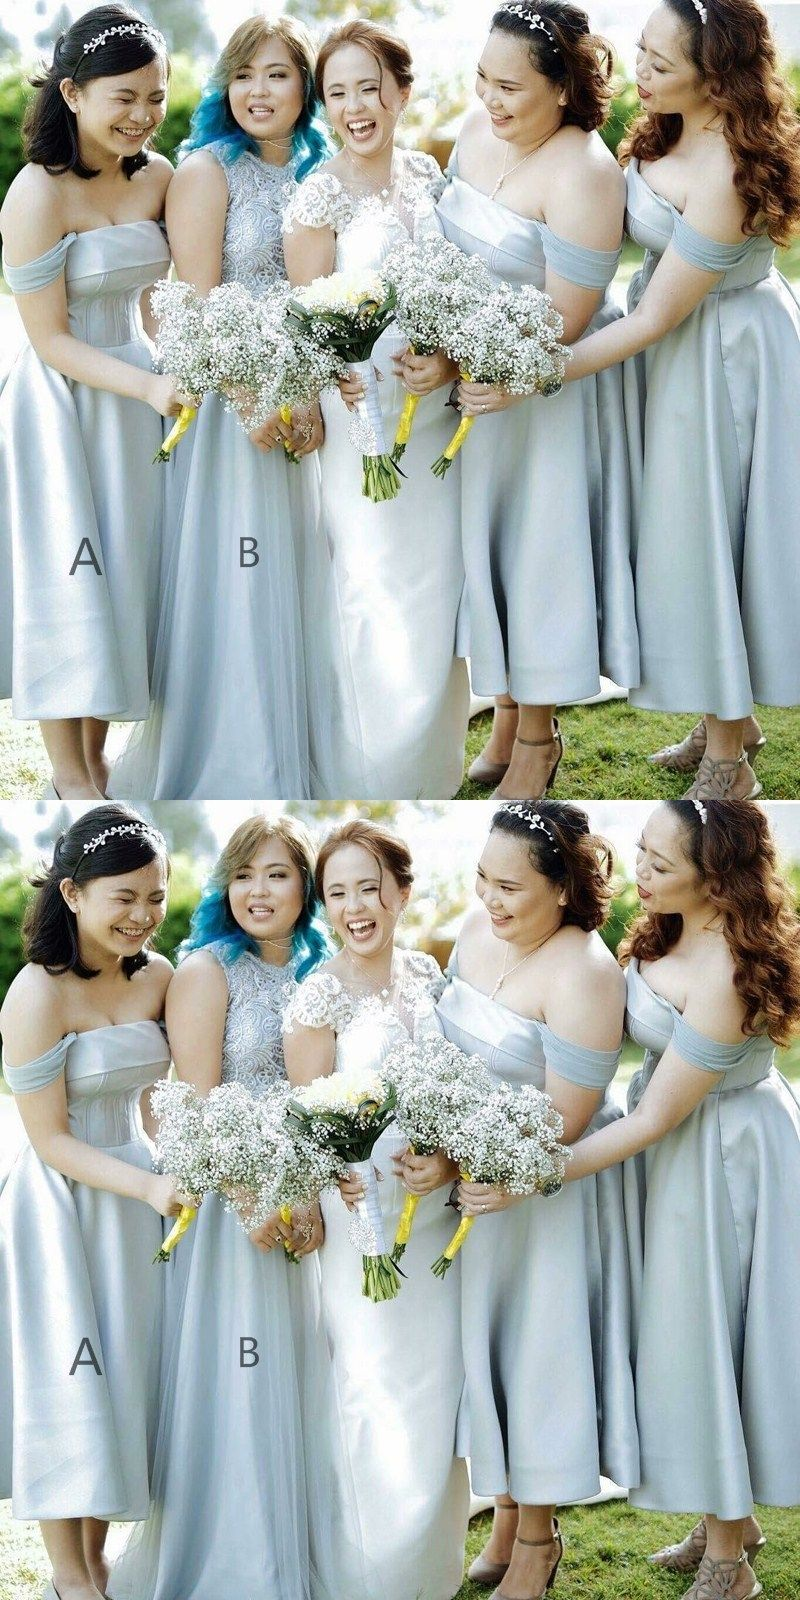 05f47fcd483e chic off shoulder bridesmaid dresses, simple fashion party dresses, elegant tea  length wedding party gowns.